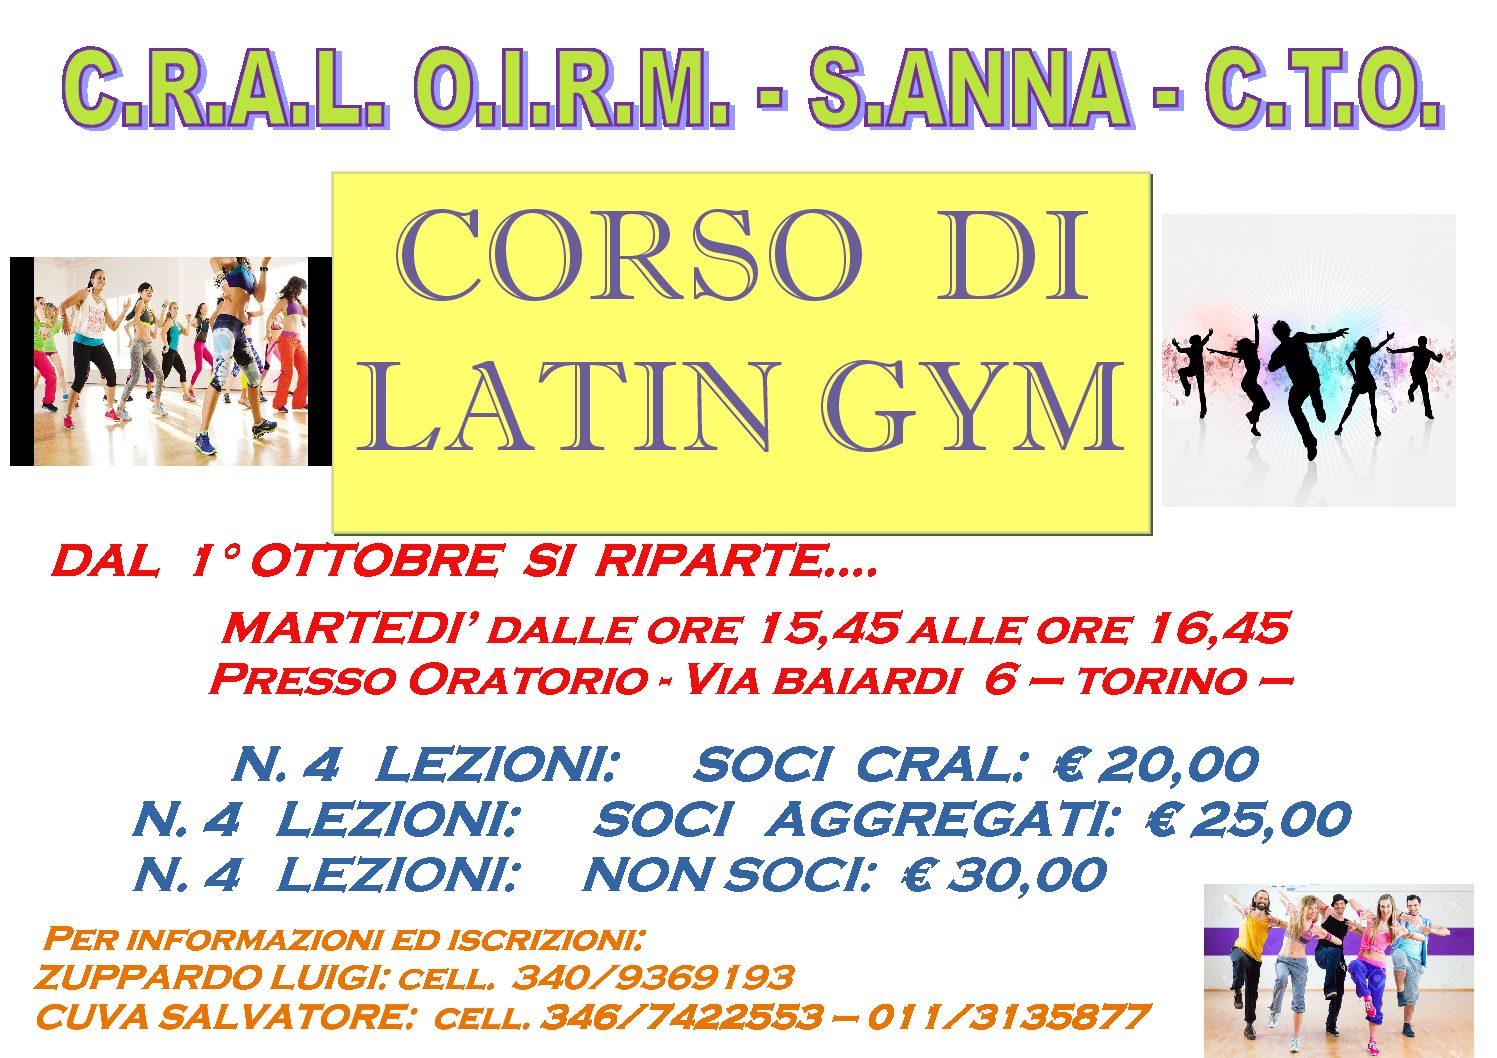 Corso di Latin Gym